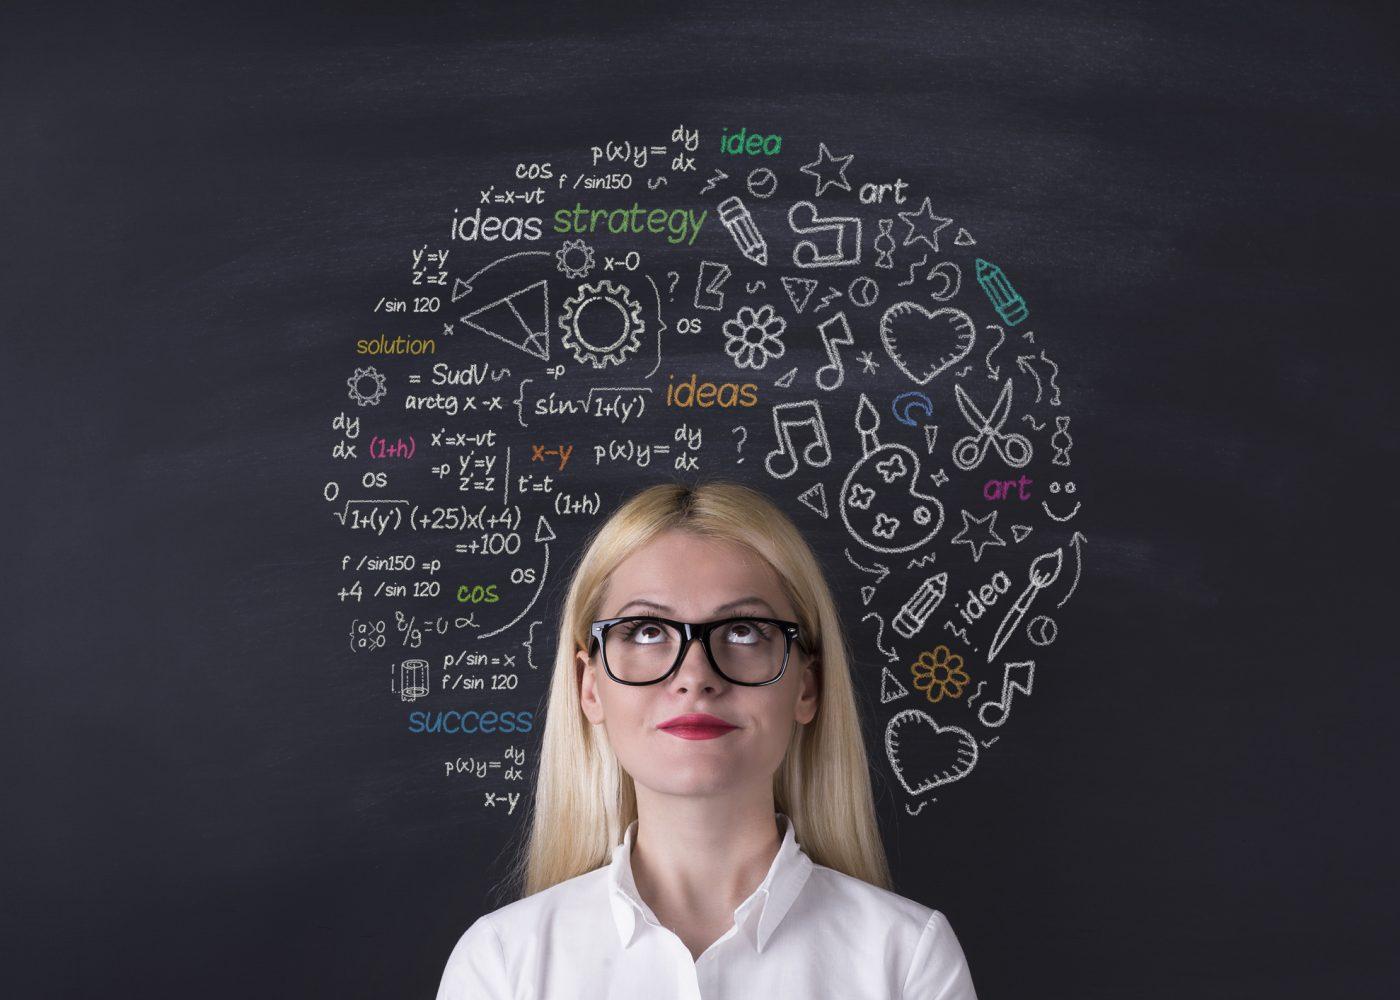 cerebro ideias pensar